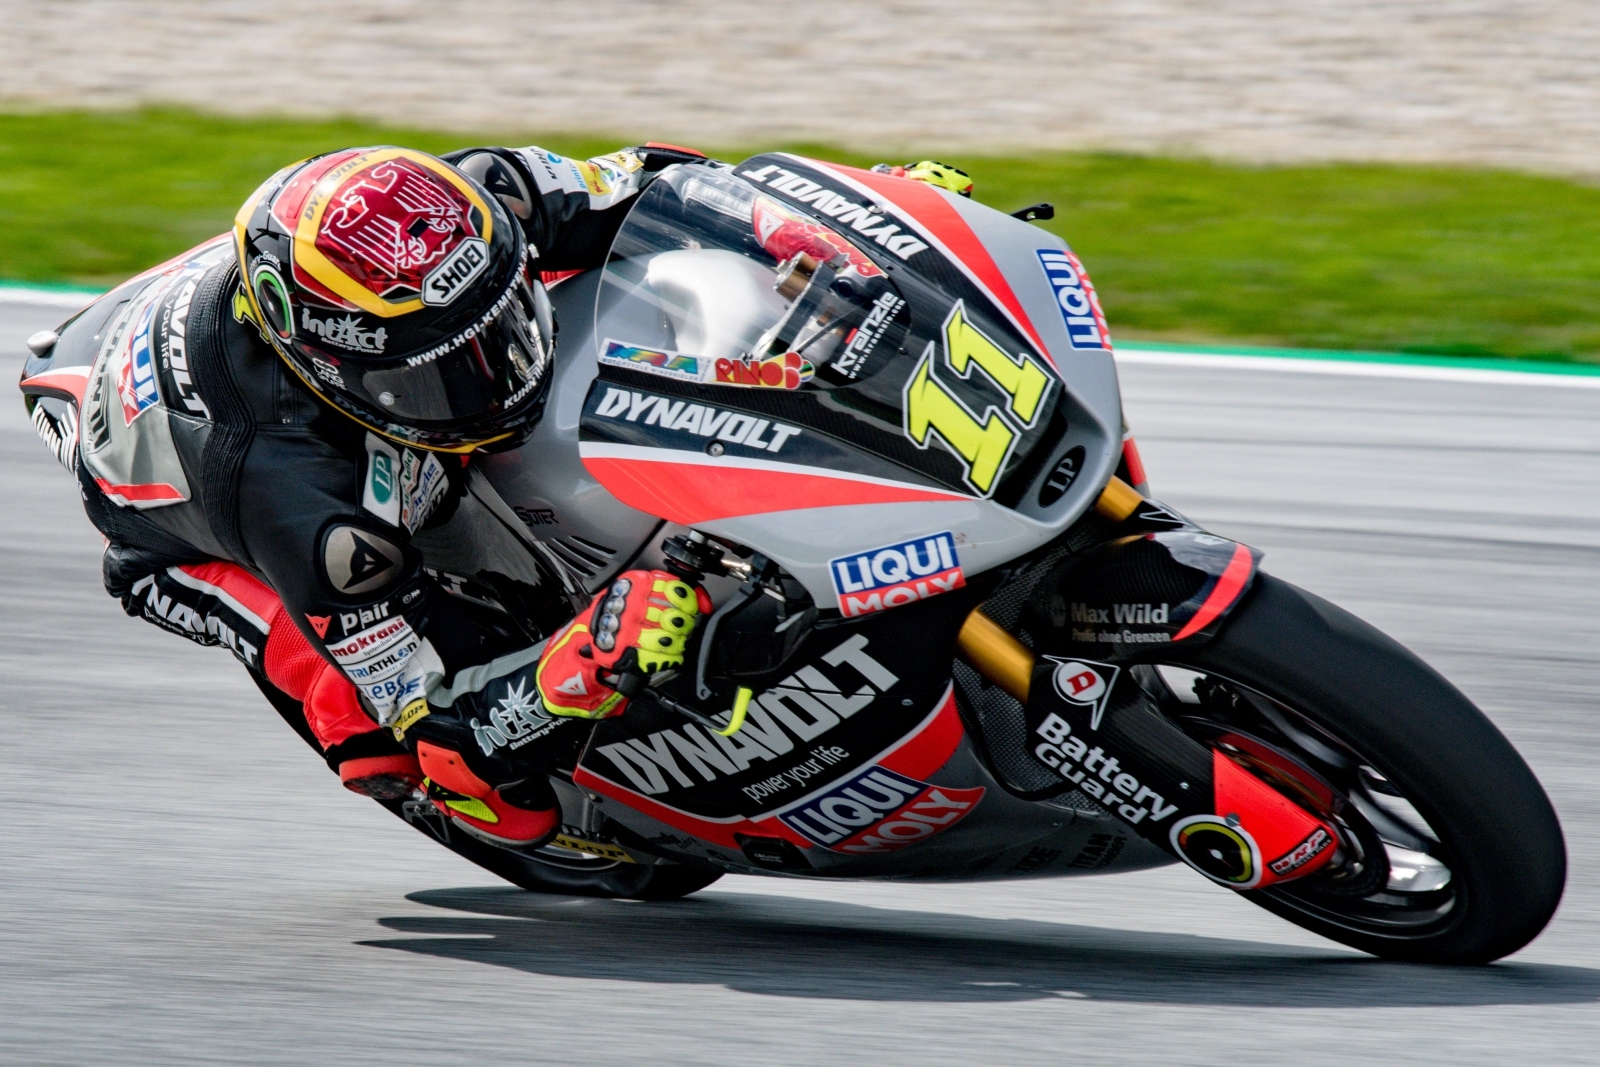 Motocyklowe Grand Prix Austrii   EPA/CHRISTIAN BRUNA